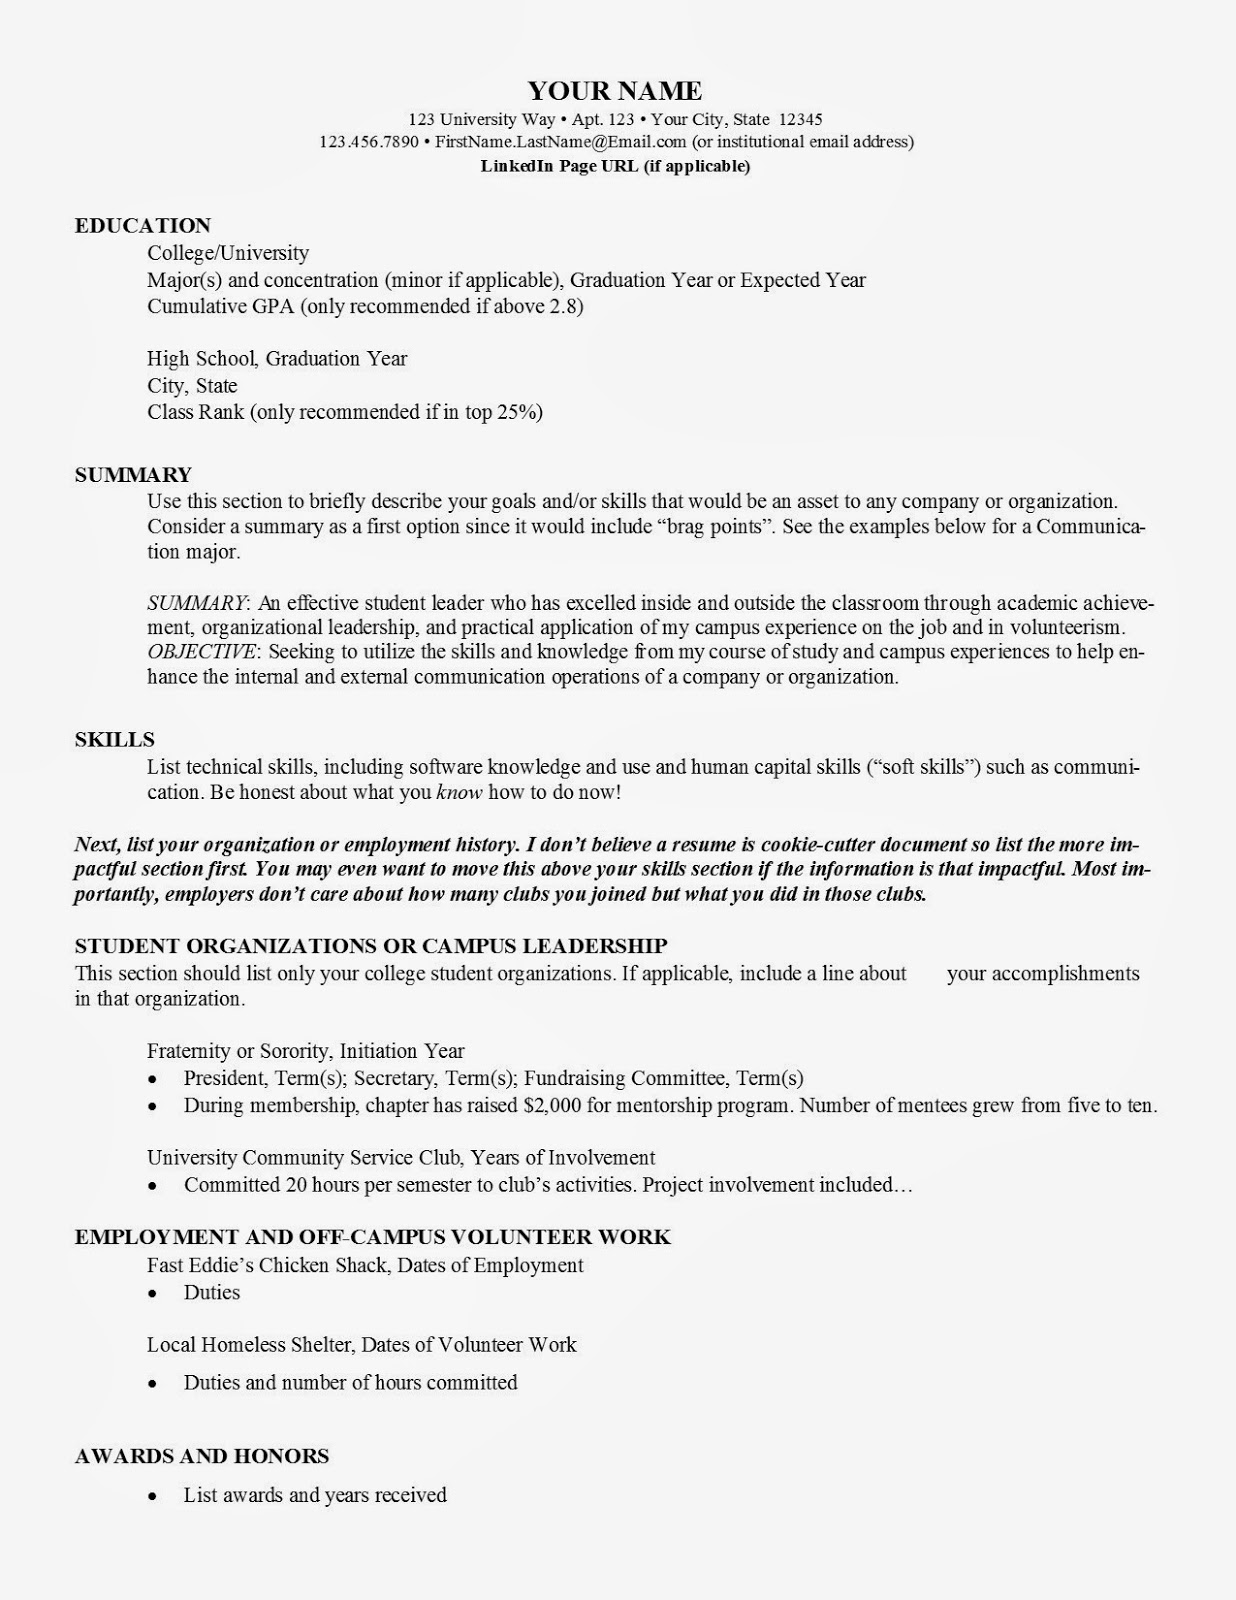 How To Make A College Resume | Resume Badak